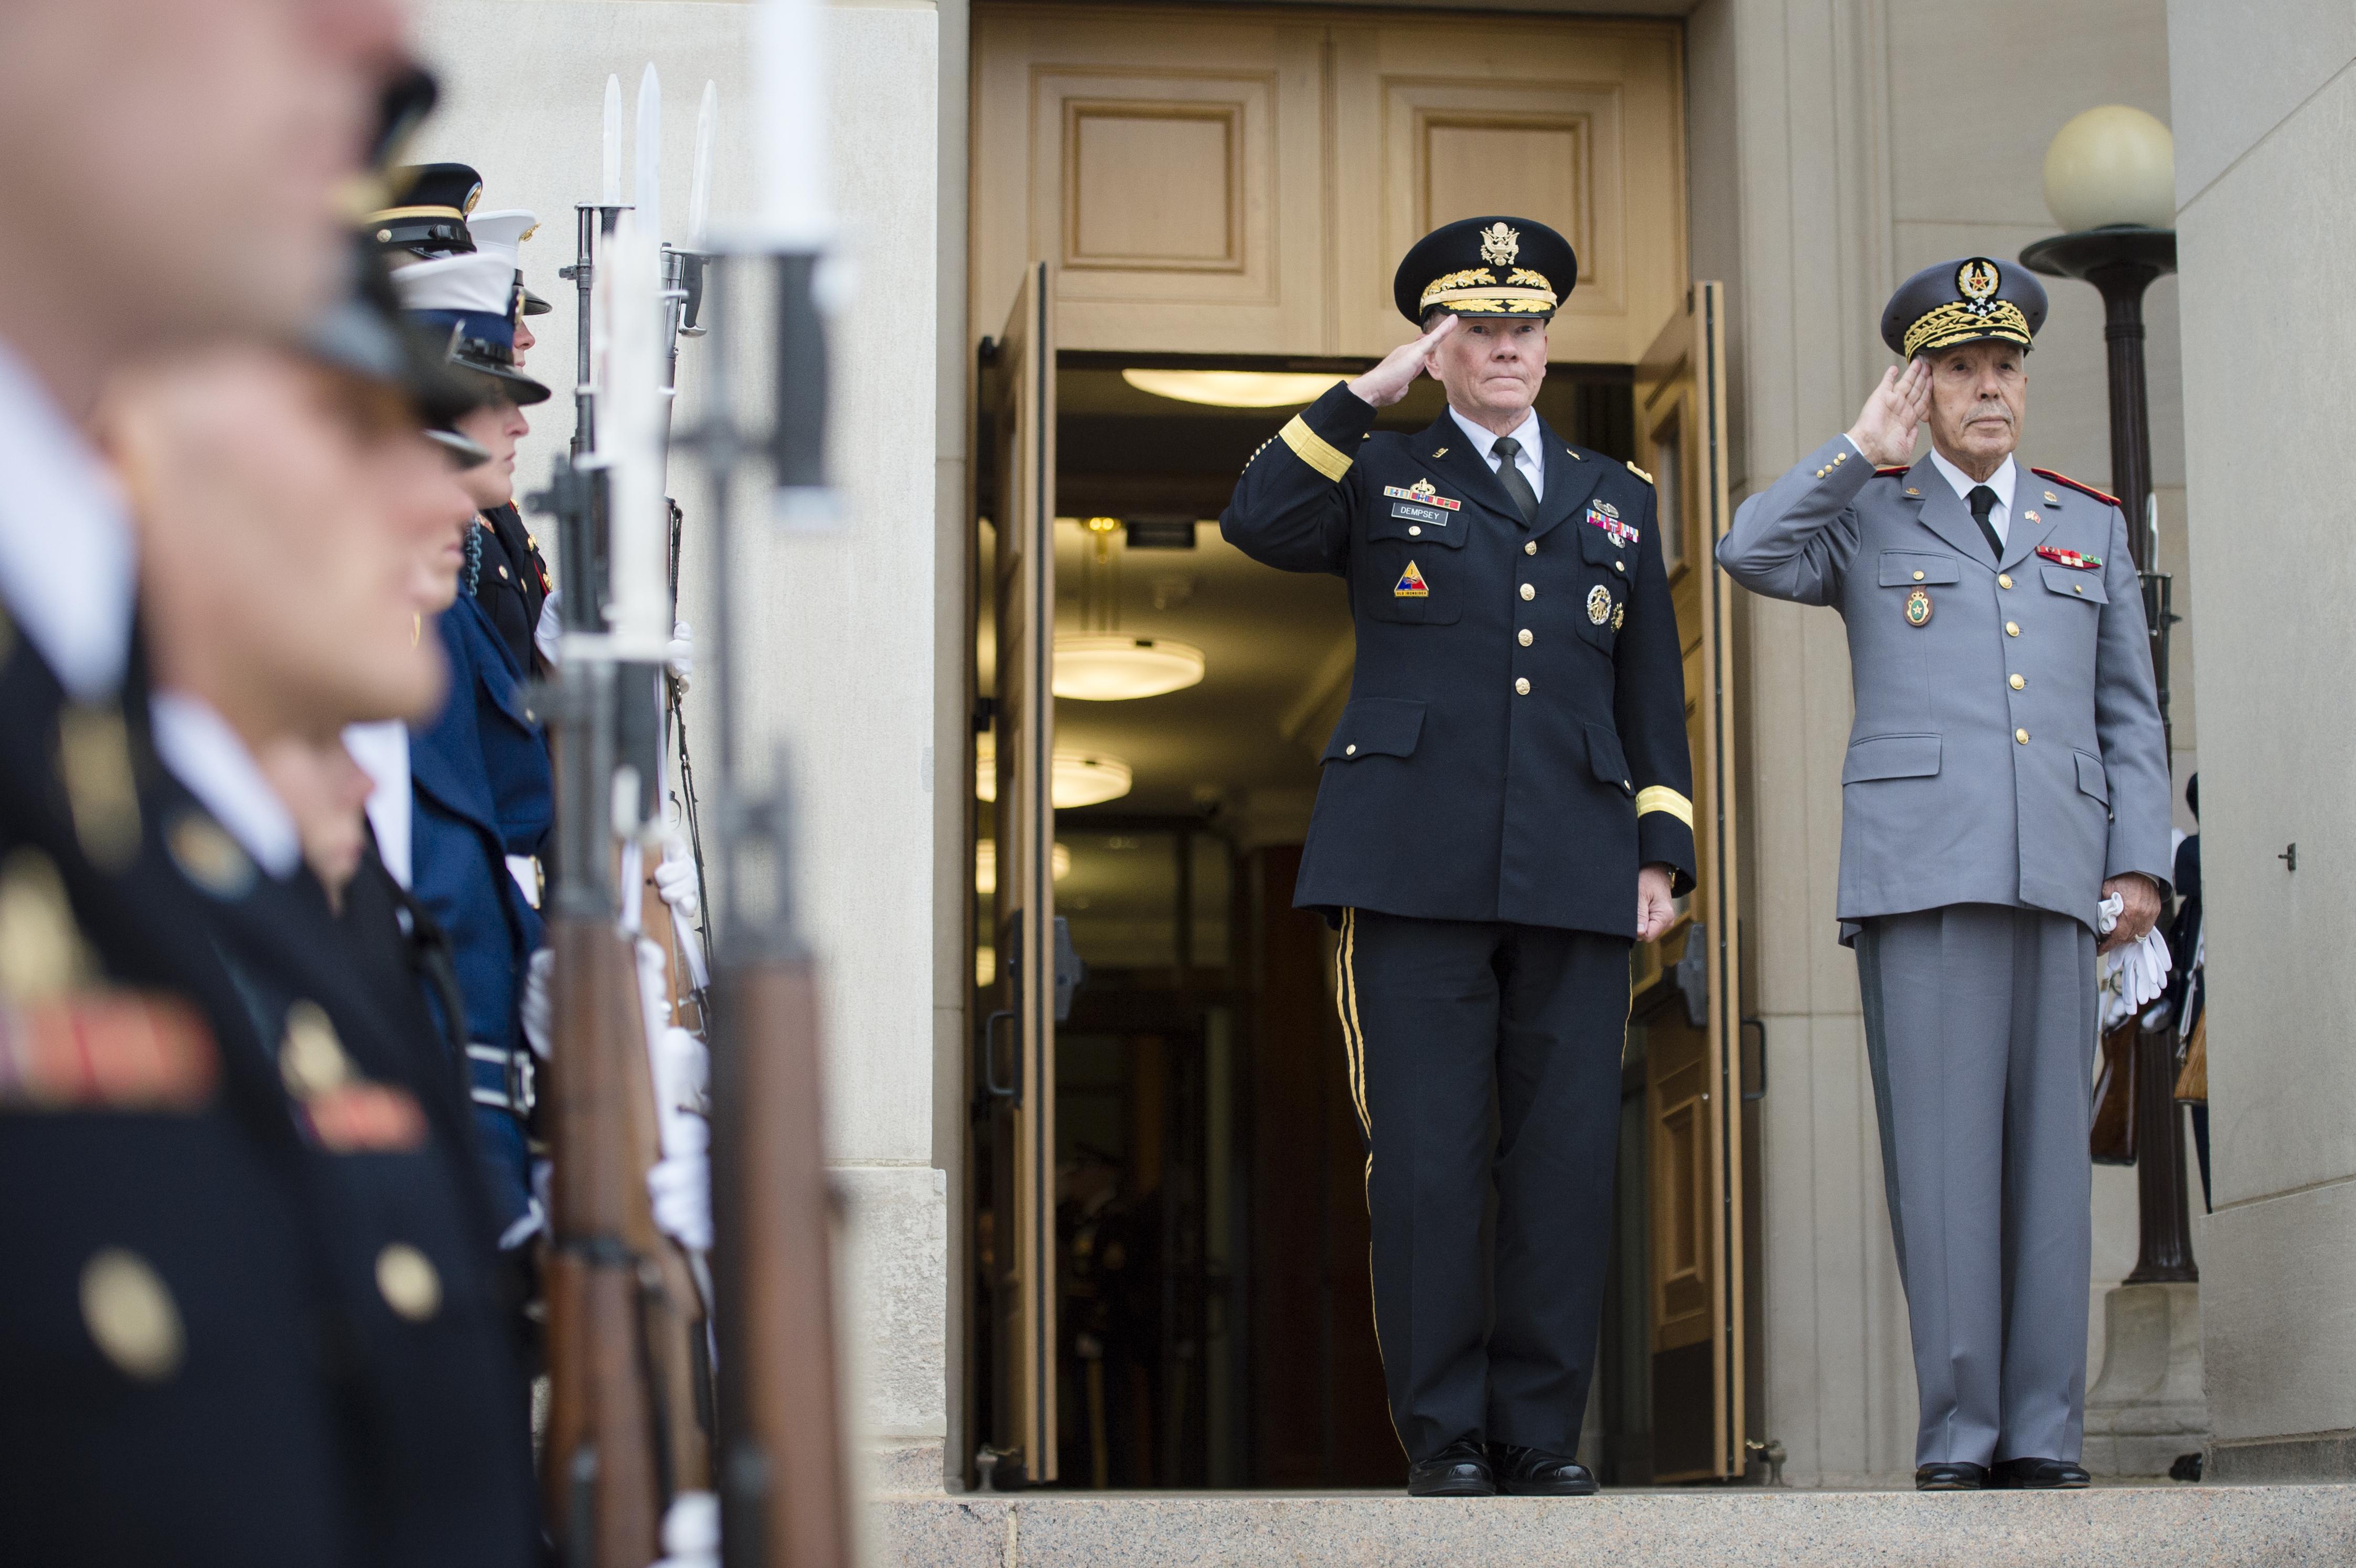 Cooperation militaire avec les USA - Page 3 15598038480_2323e42138_o